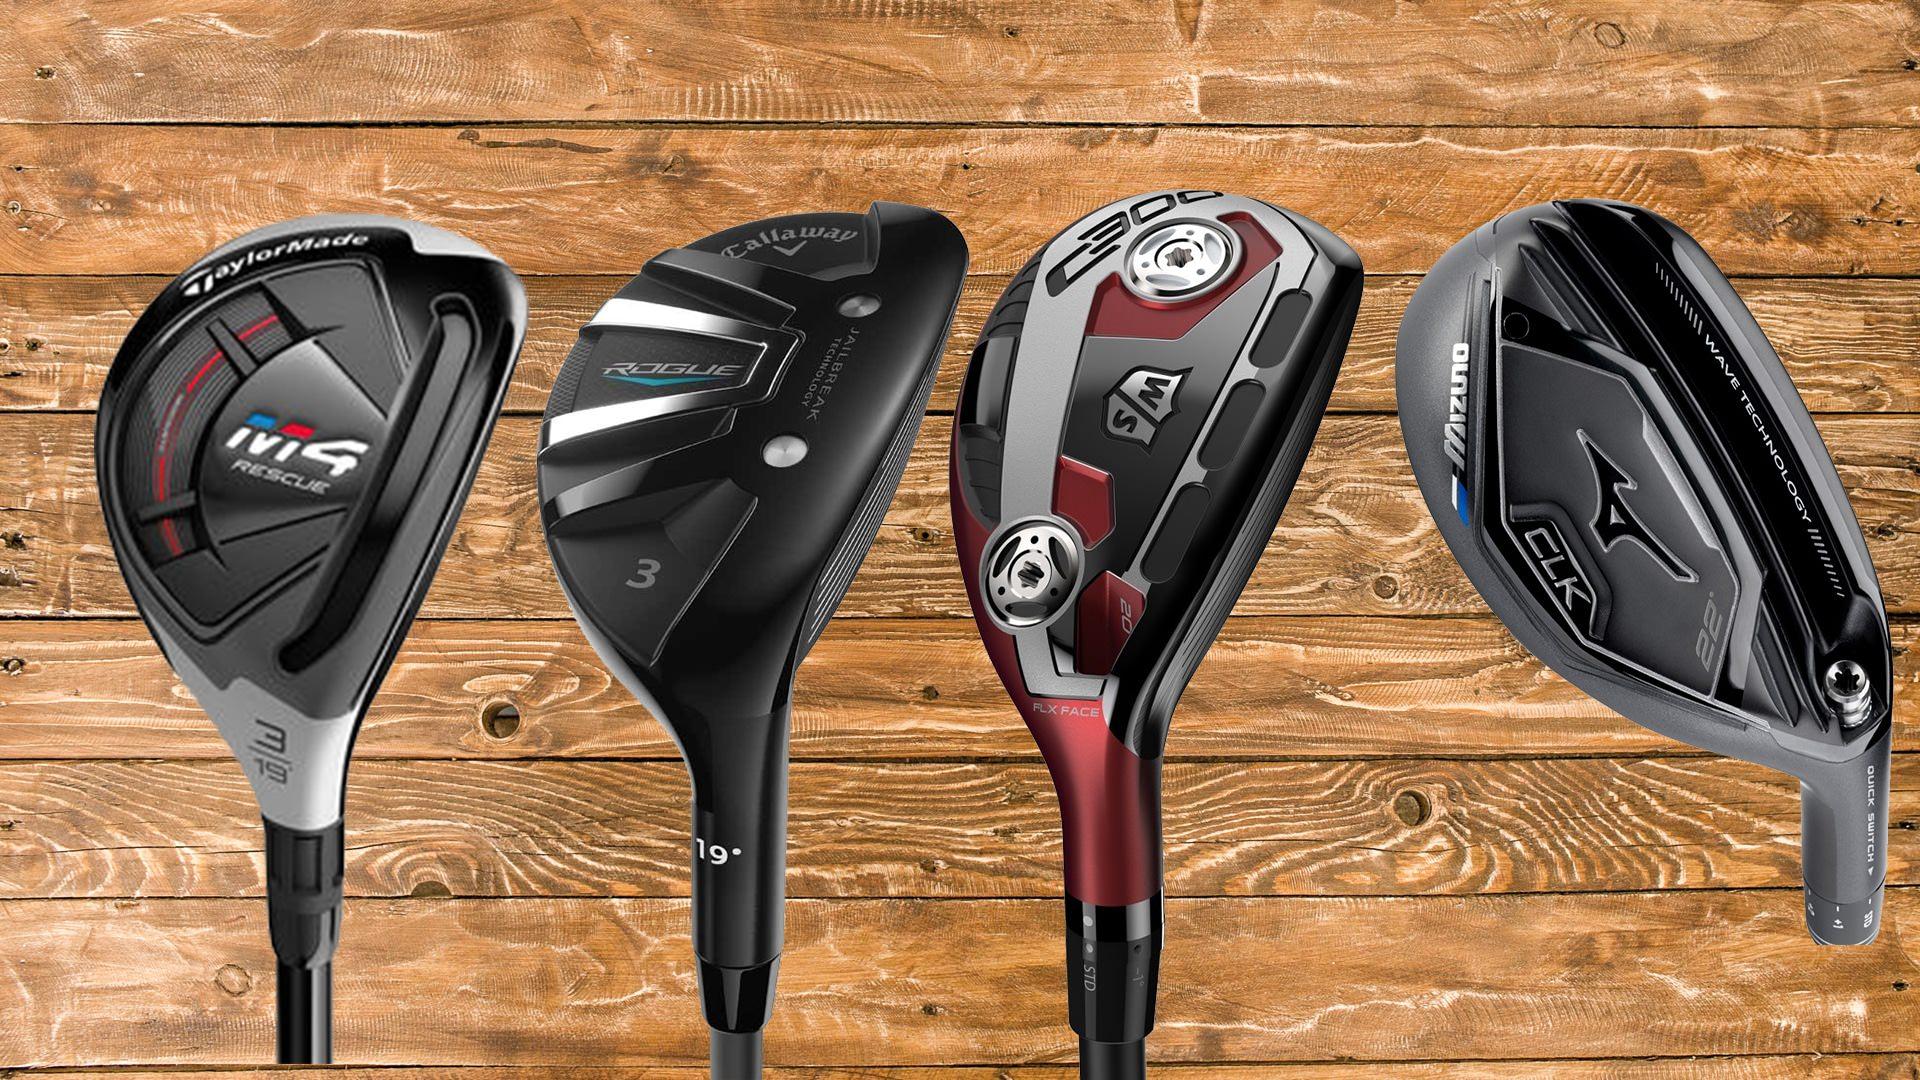 Best golf hybrids 2018 - Golf Equipment - National Club Golfer